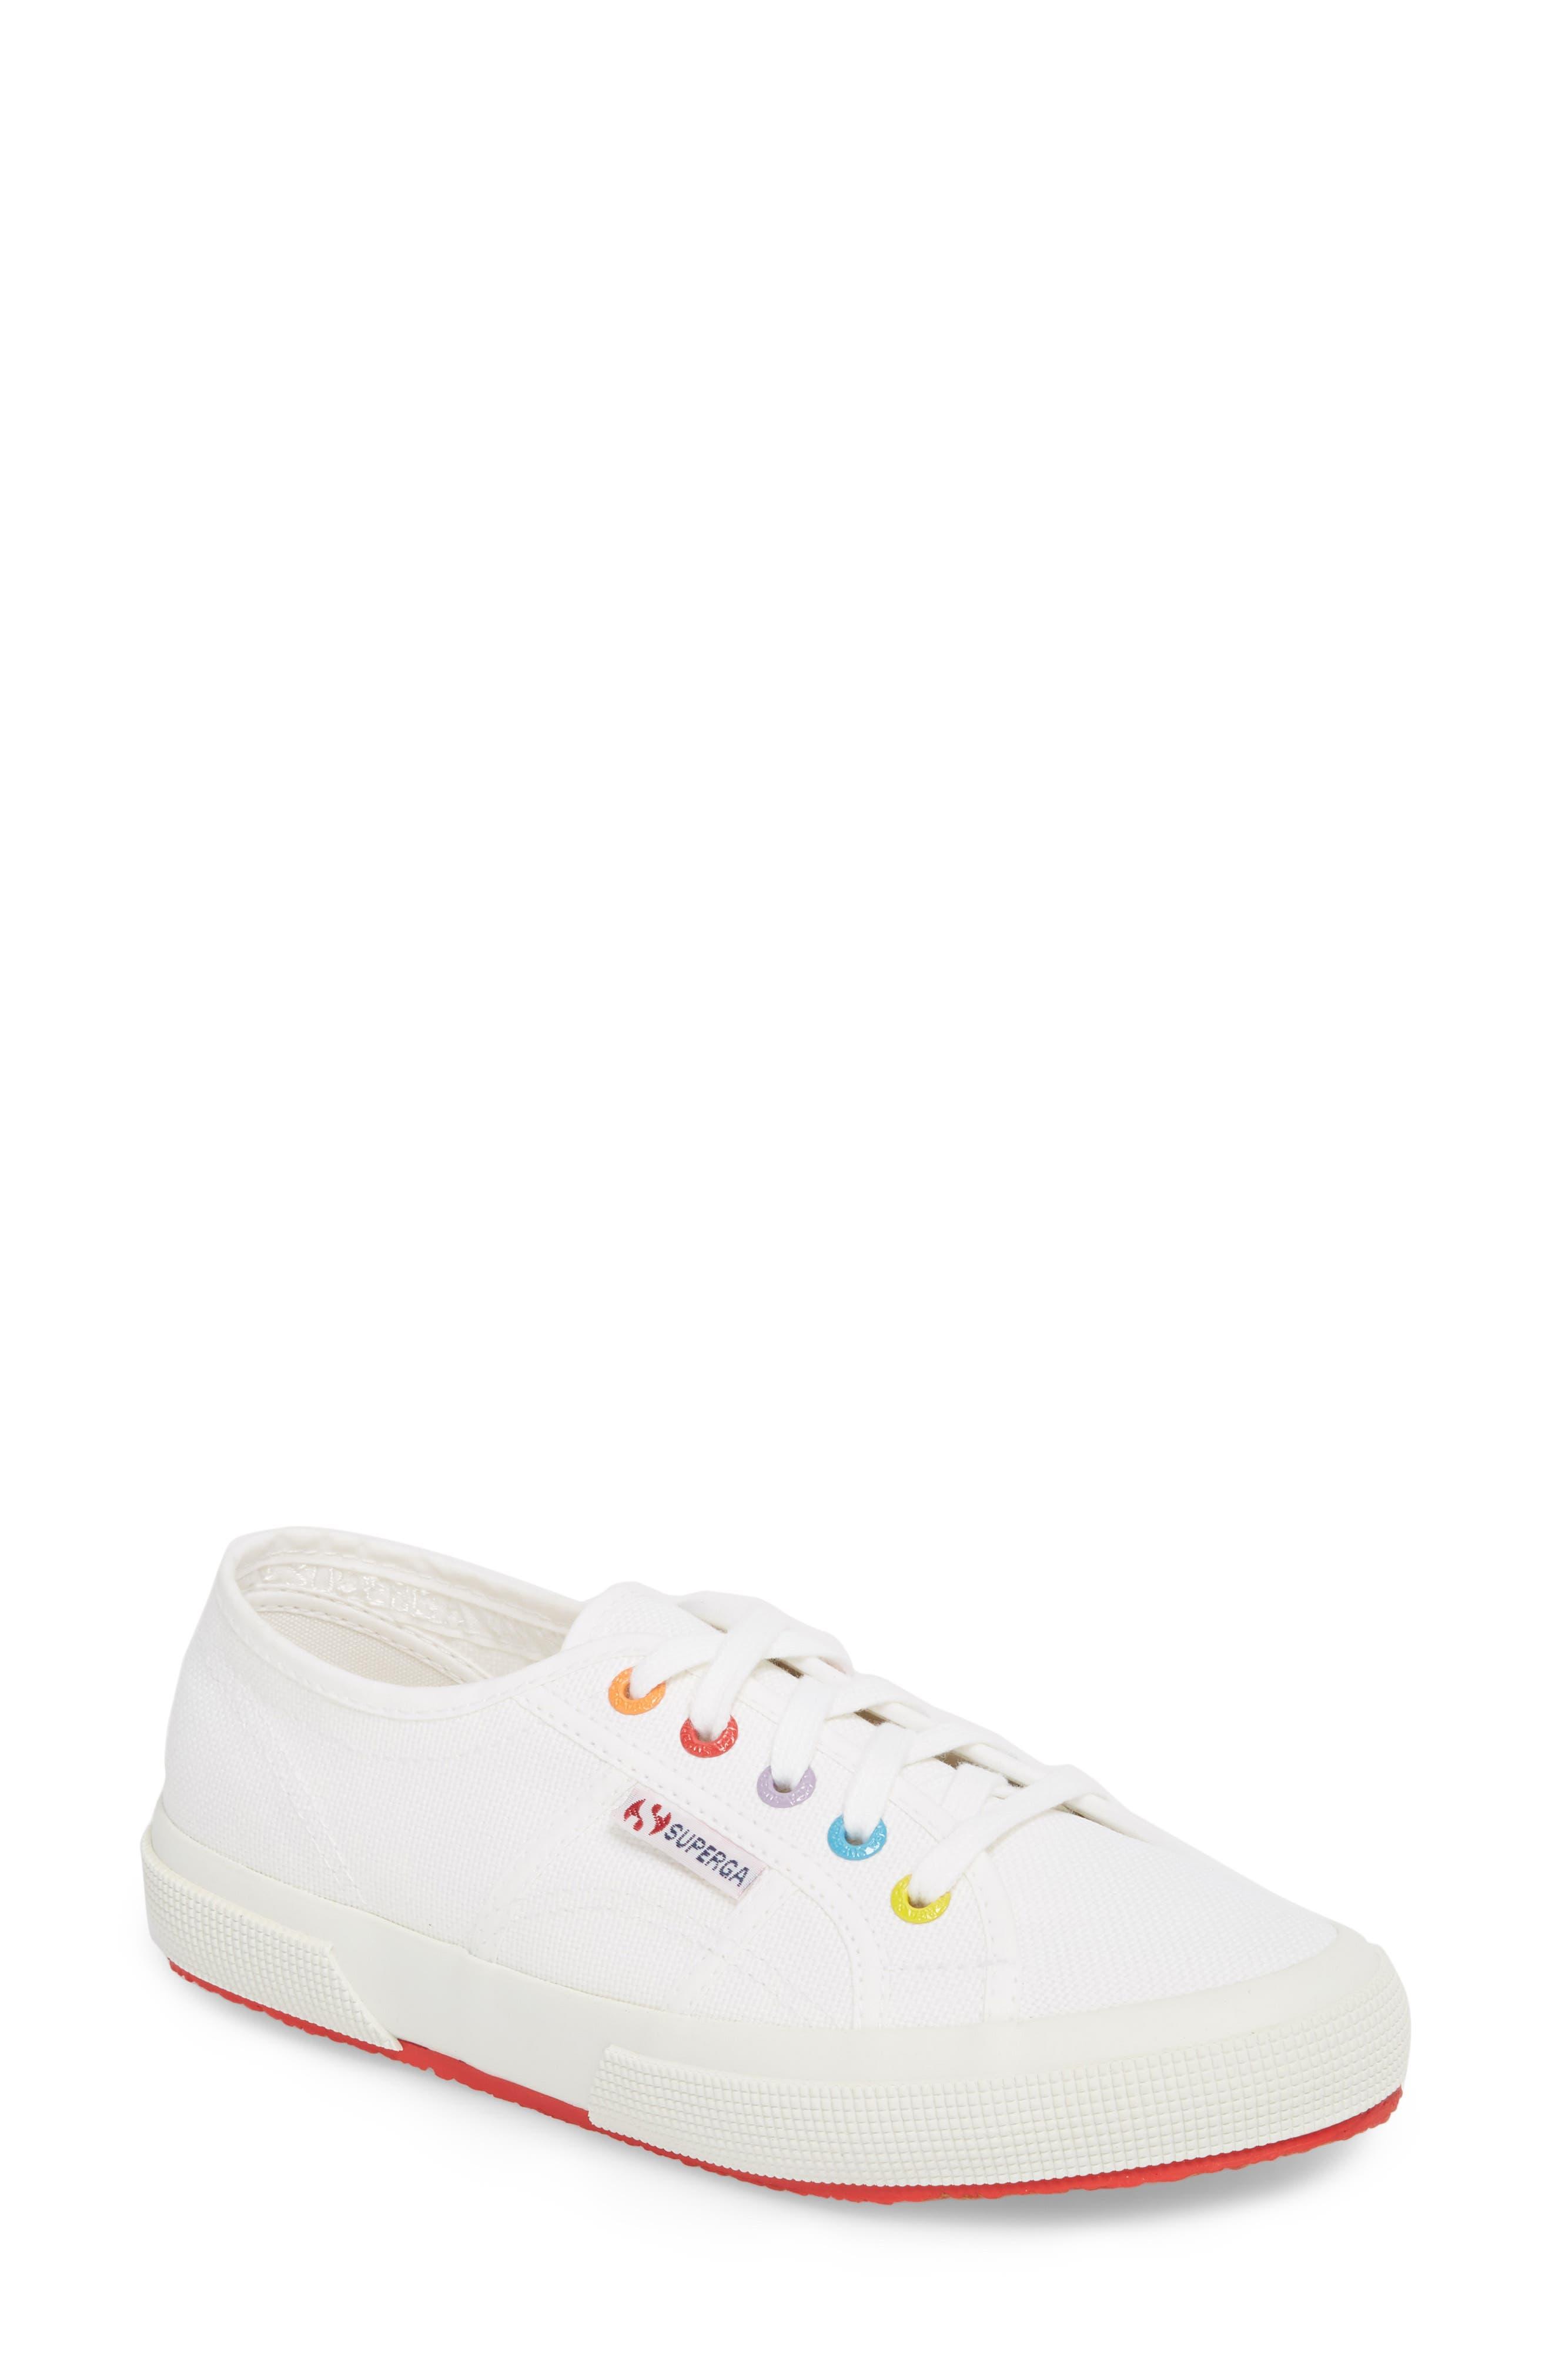 2750 Rainbow Sneaker,                             Main thumbnail 1, color,